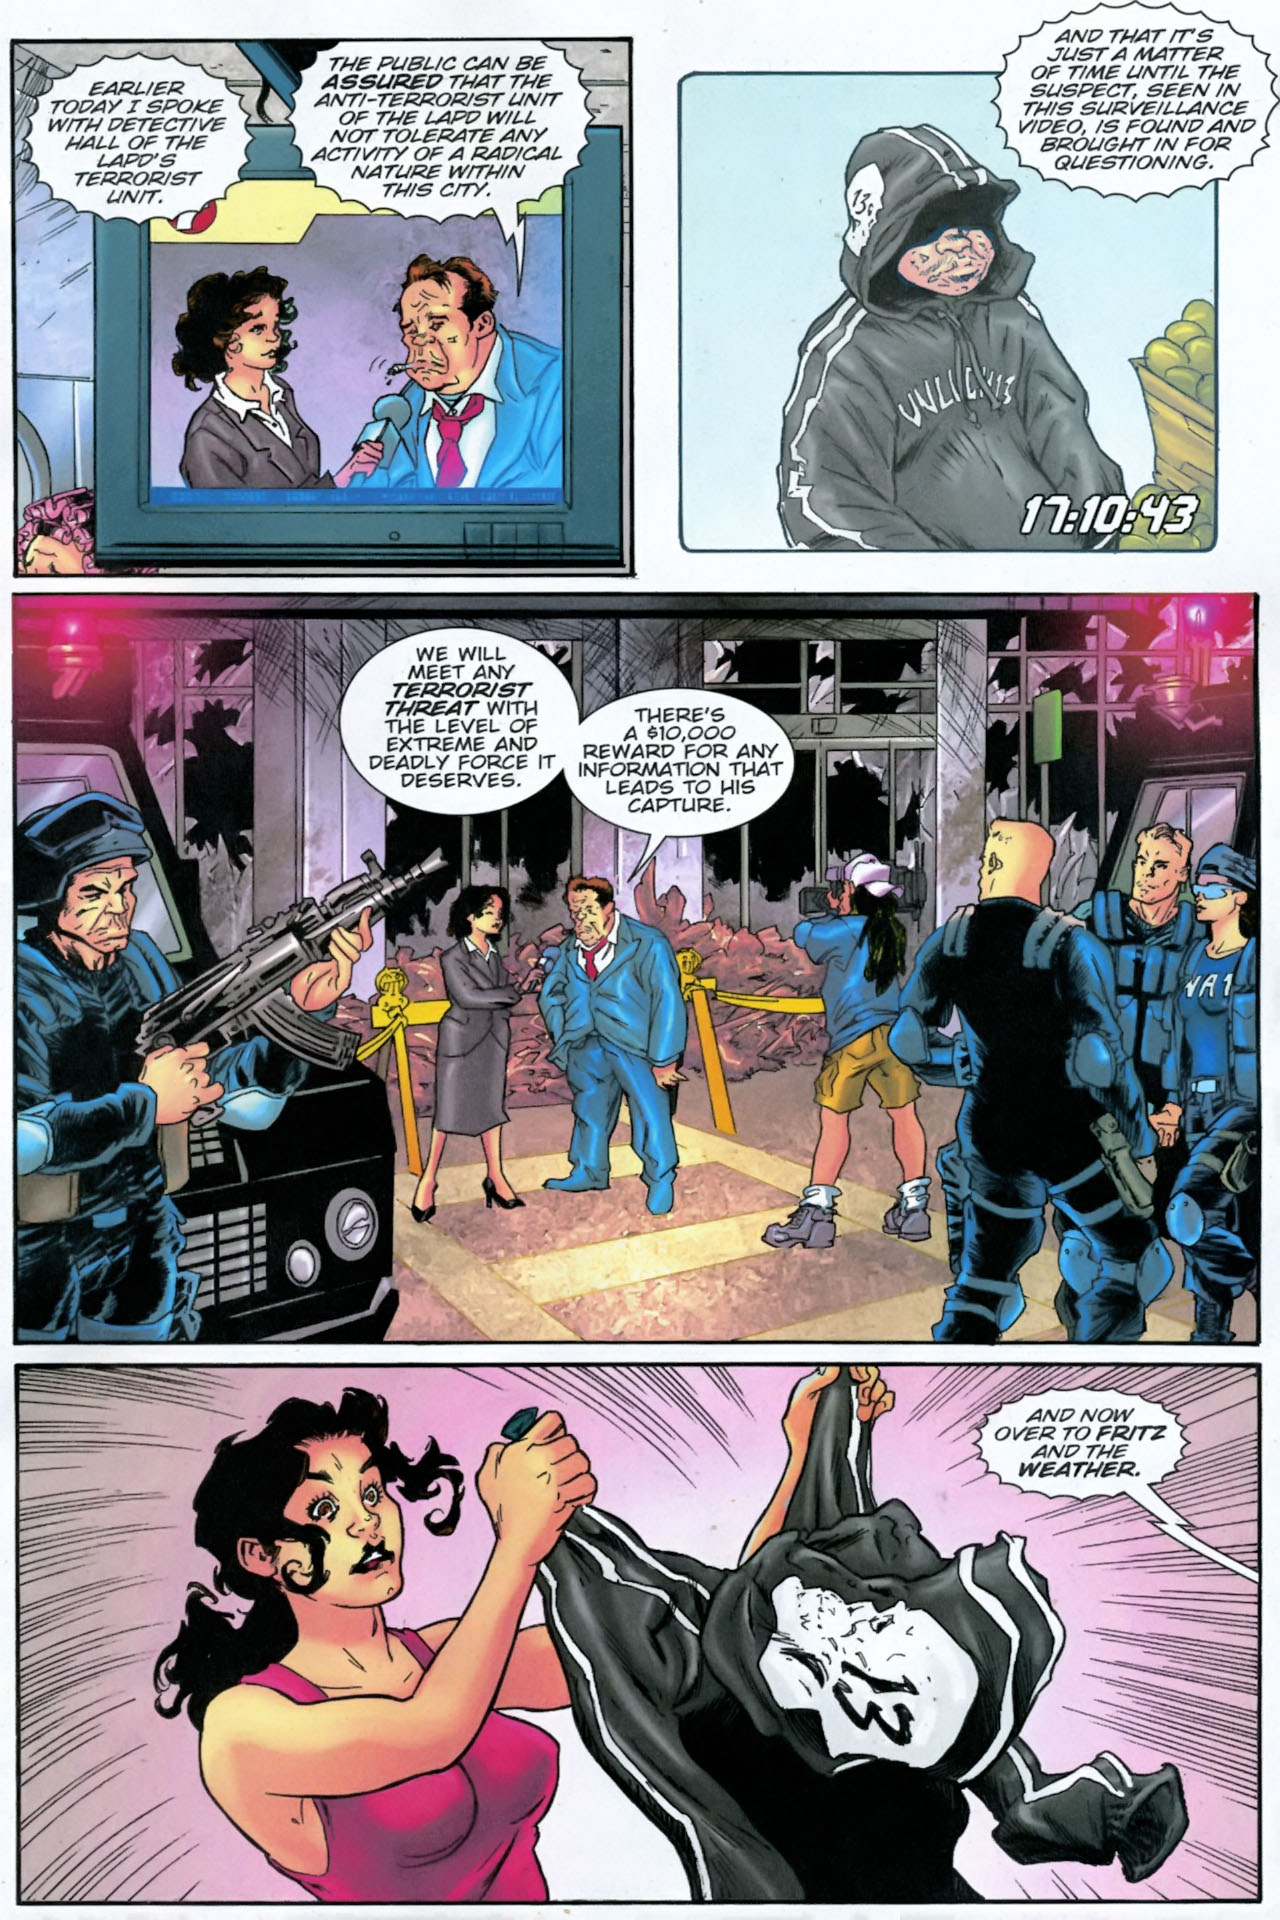 Read online The Exterminators comic -  Issue #27 - 13